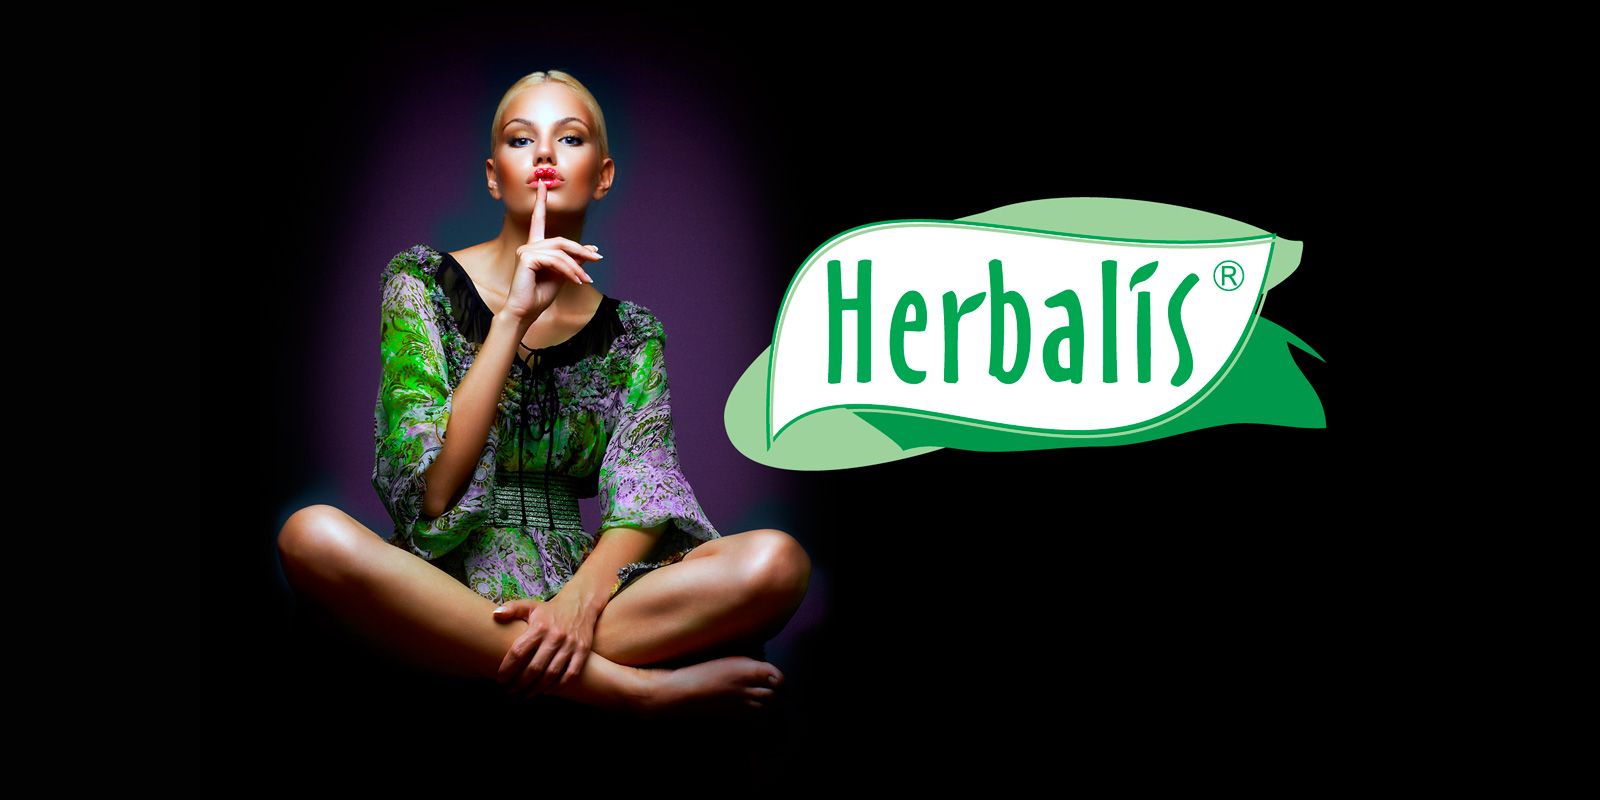 TM «Herbalis»;;;;;;Разработка логотипа (средство по уходу за телом);;;;;;<span>Клиент:</span> Компания «Авито Brand Company»;;;;;;;;;;;;Разработка логотипа (средство по уходу за телом);;;;;;1